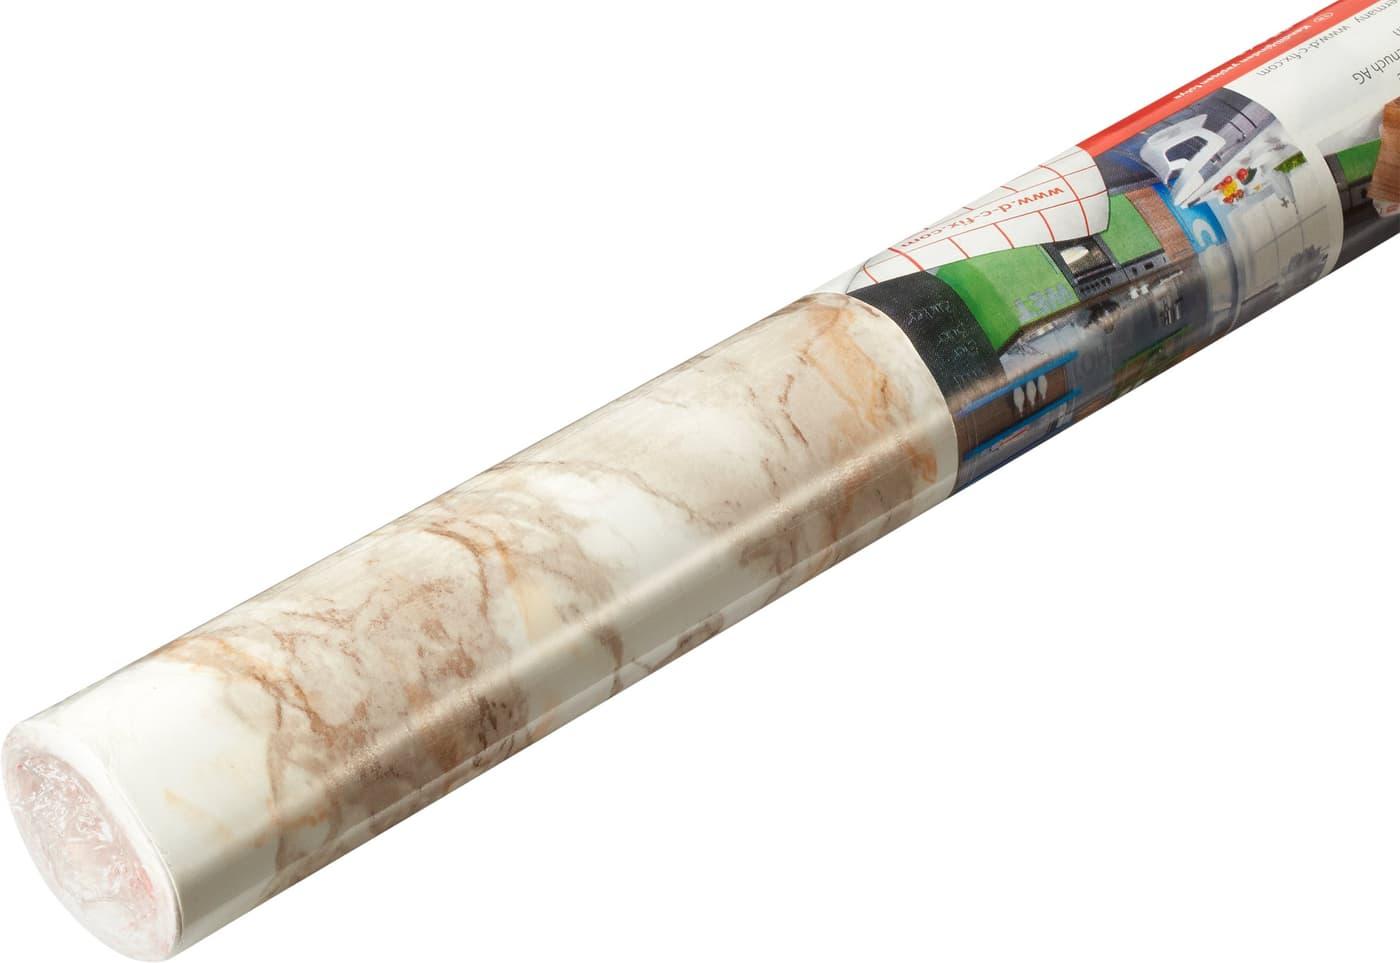 D c fix dekofolien selbstklebend marmor cortes migros for Dekofolien selbstklebend